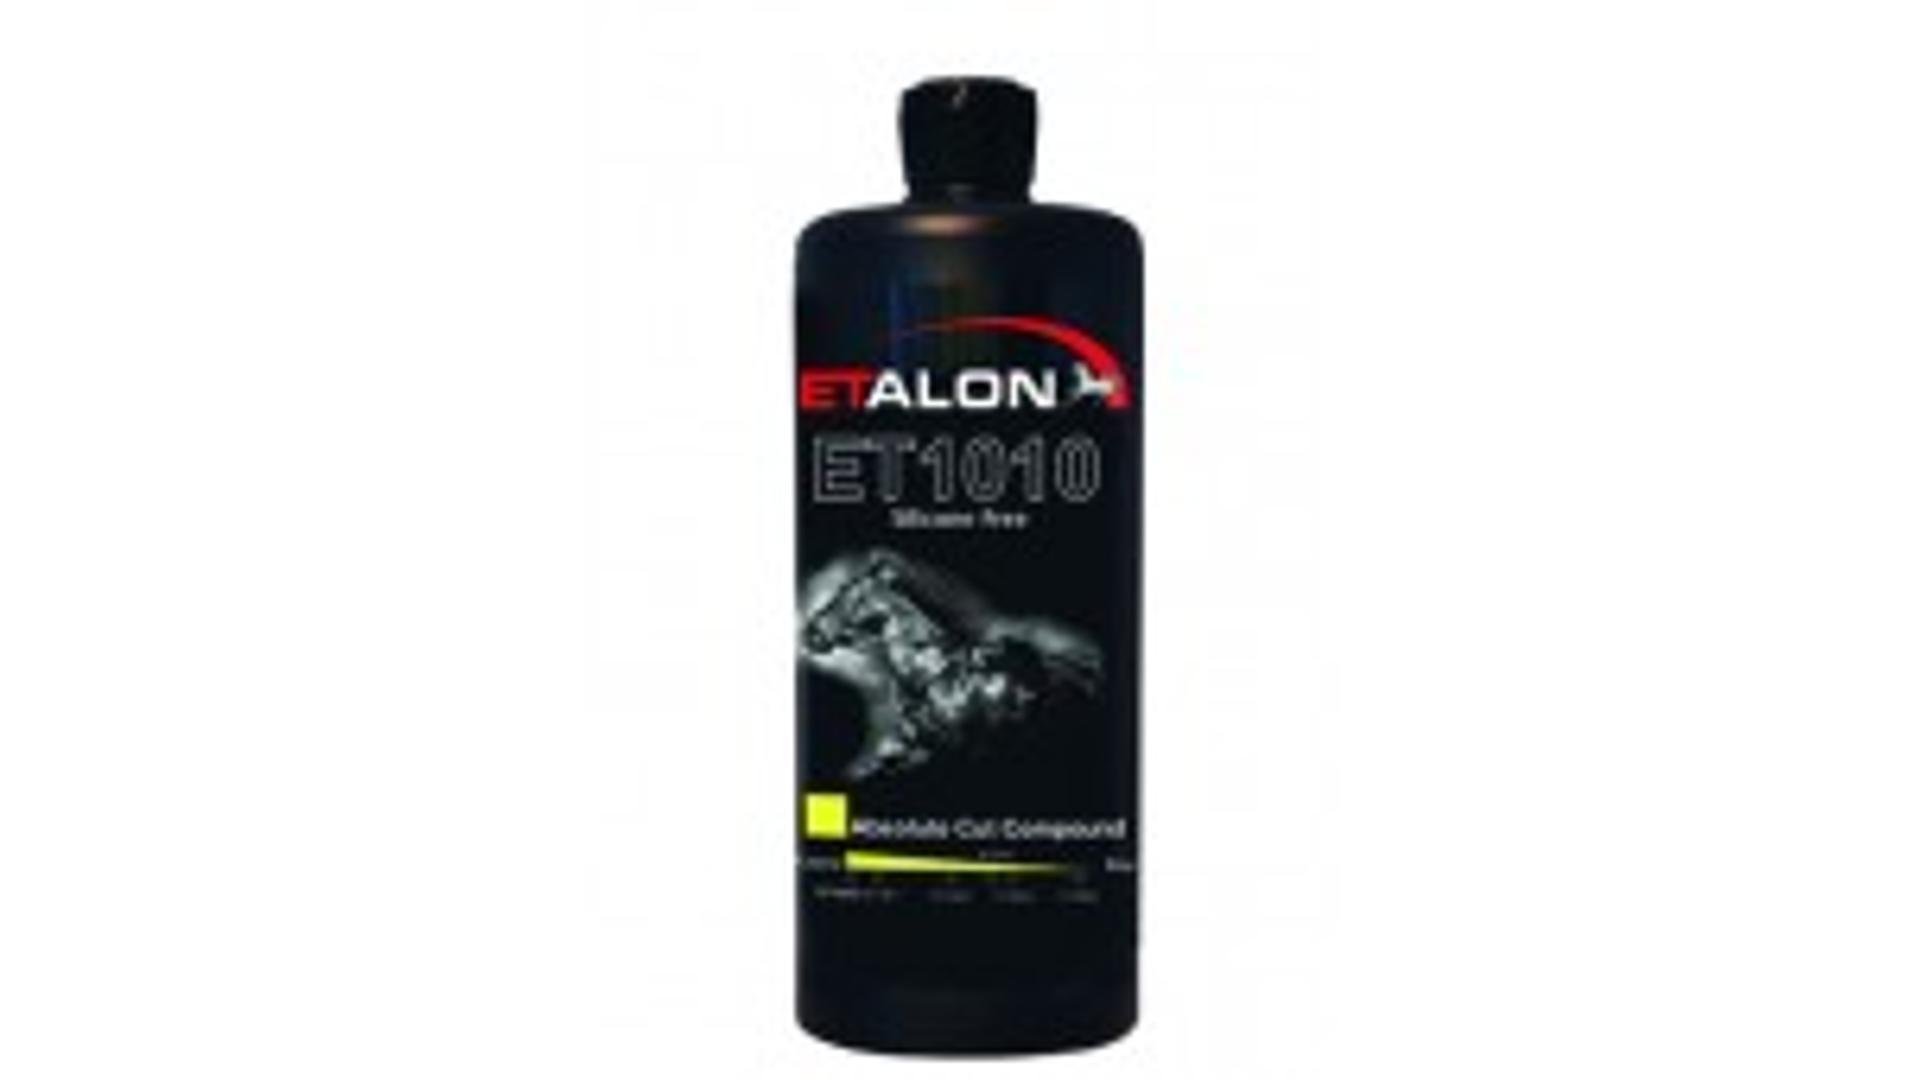 ETALON 1010 - univerzálna leštiaca pasta brúsna 250g